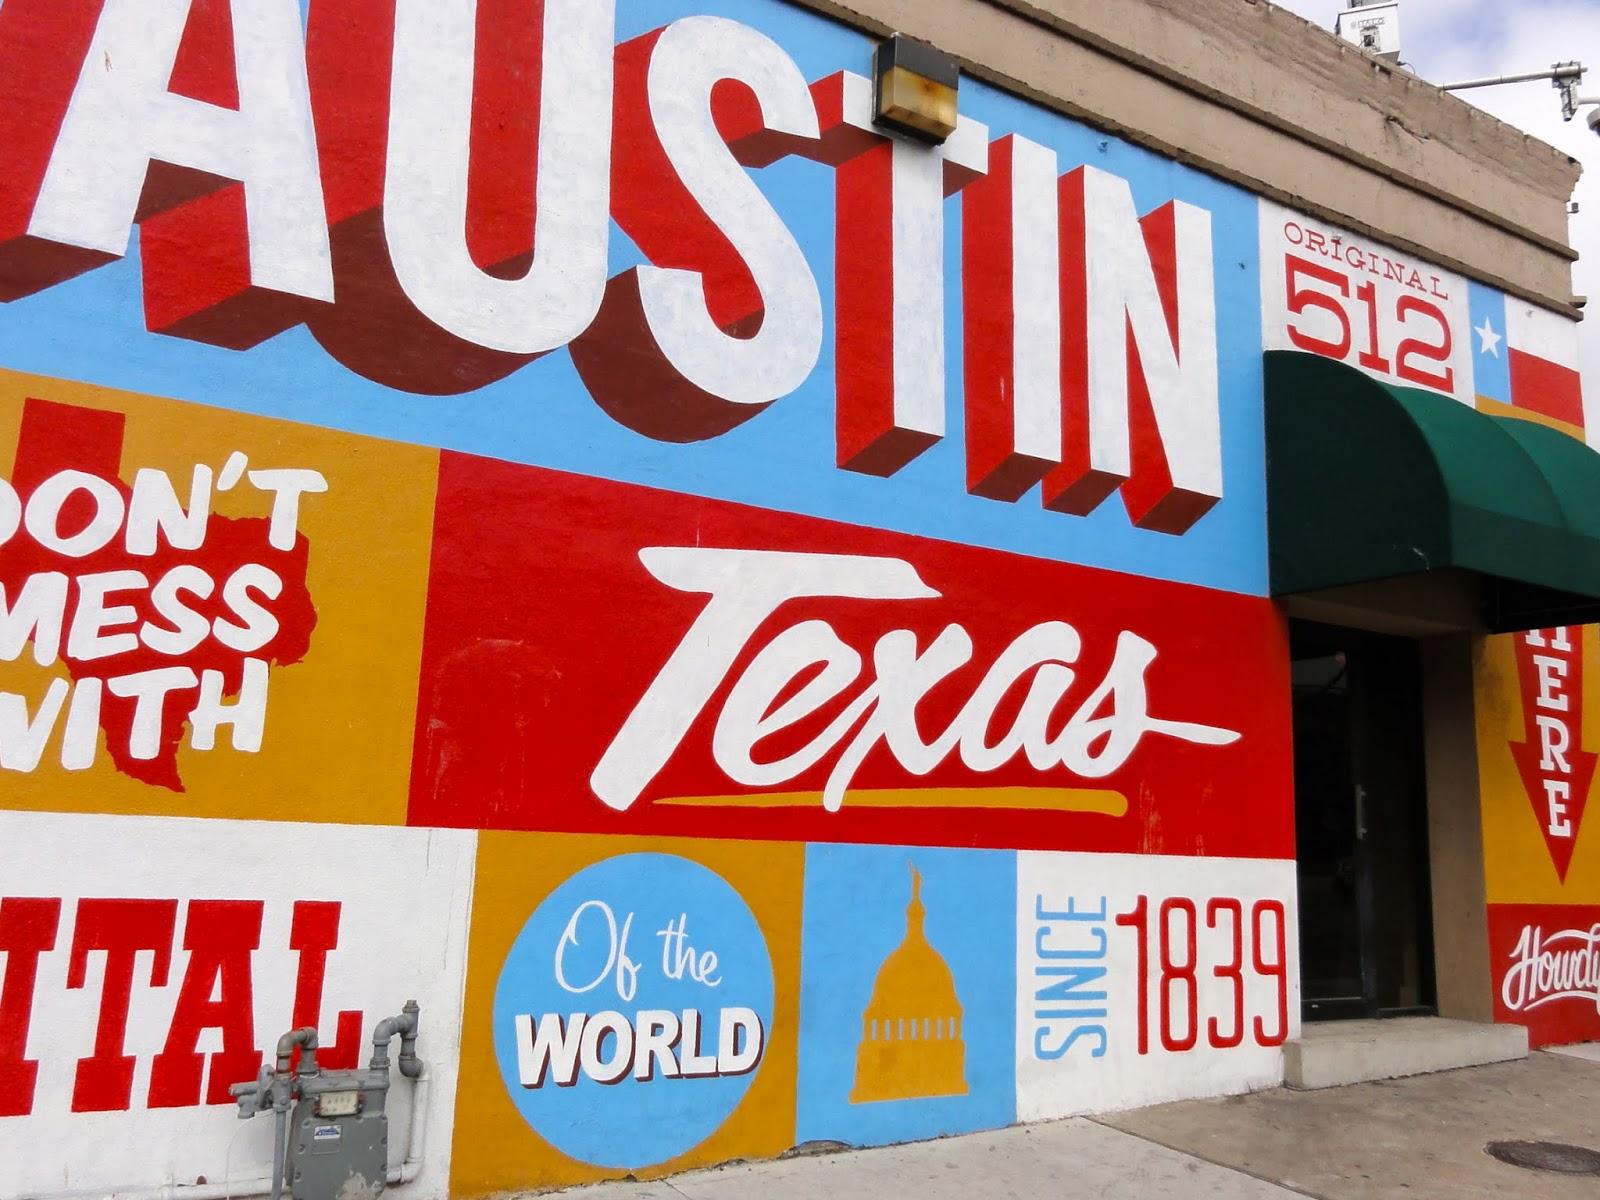 Austin art found downtown